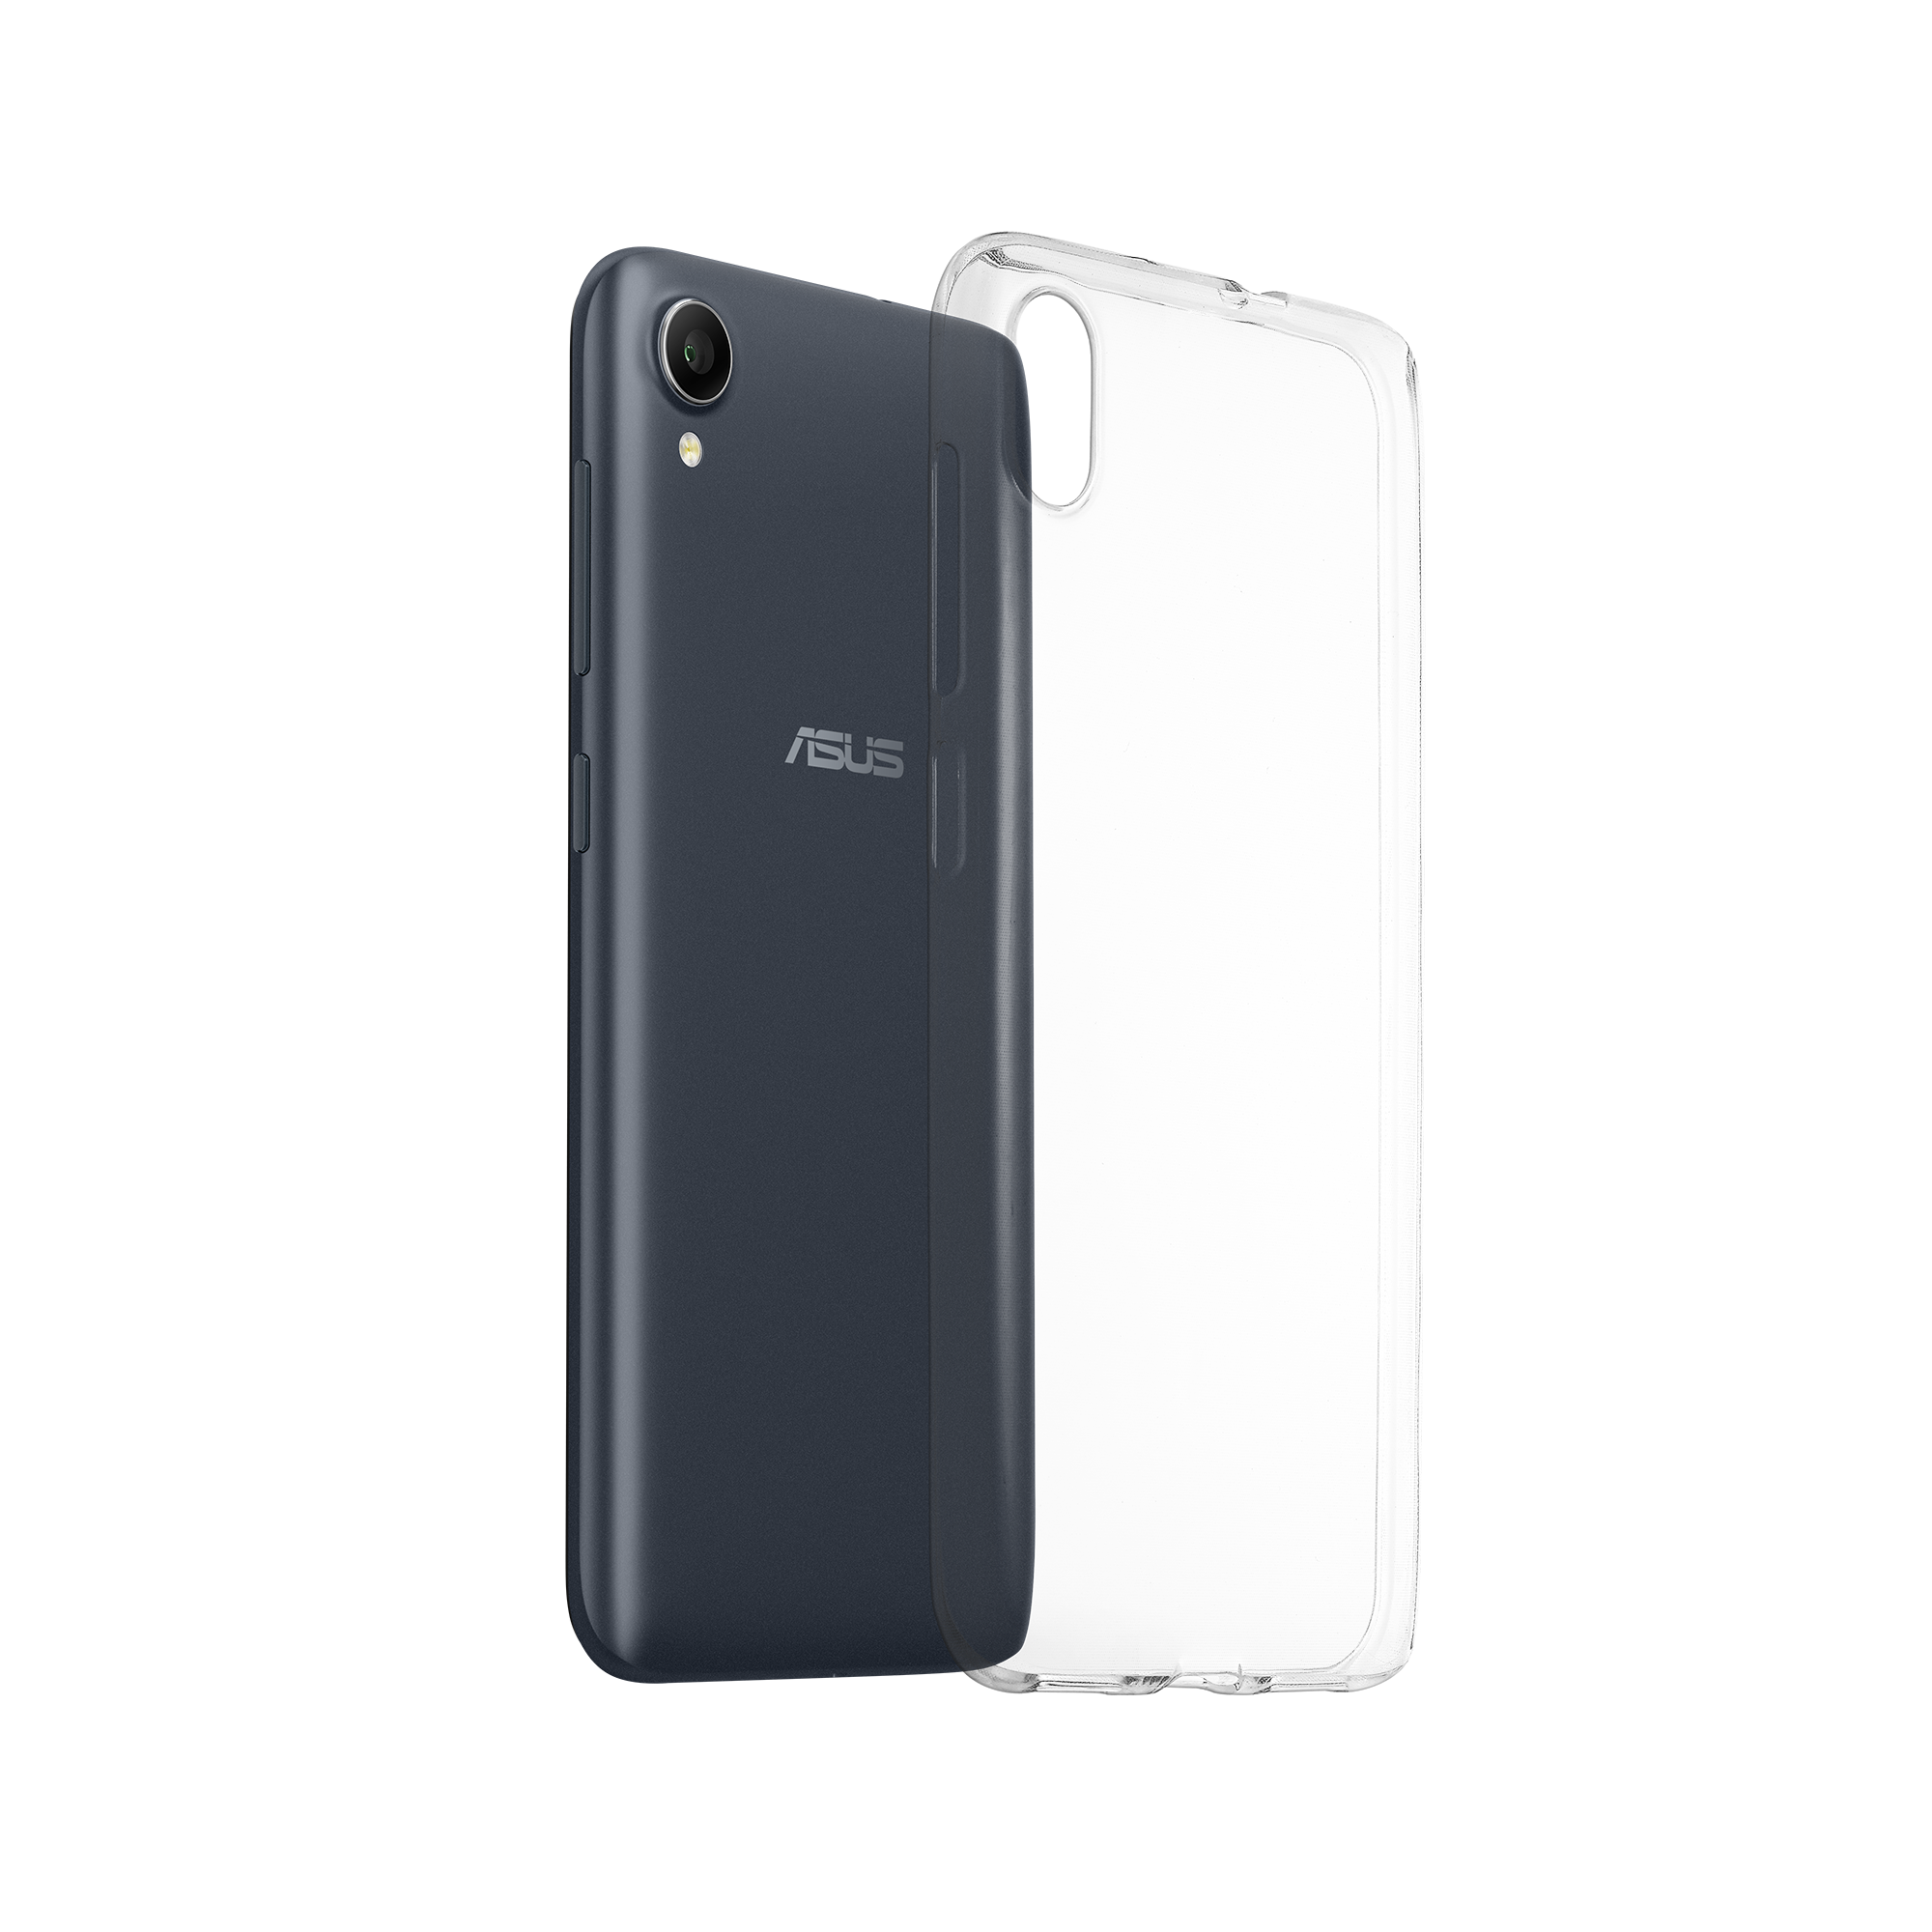 on sale a90fe e26e4 ZenFone Live (L1) Clear Soft Bumper (ZA550KL) | Phone Accessories ...